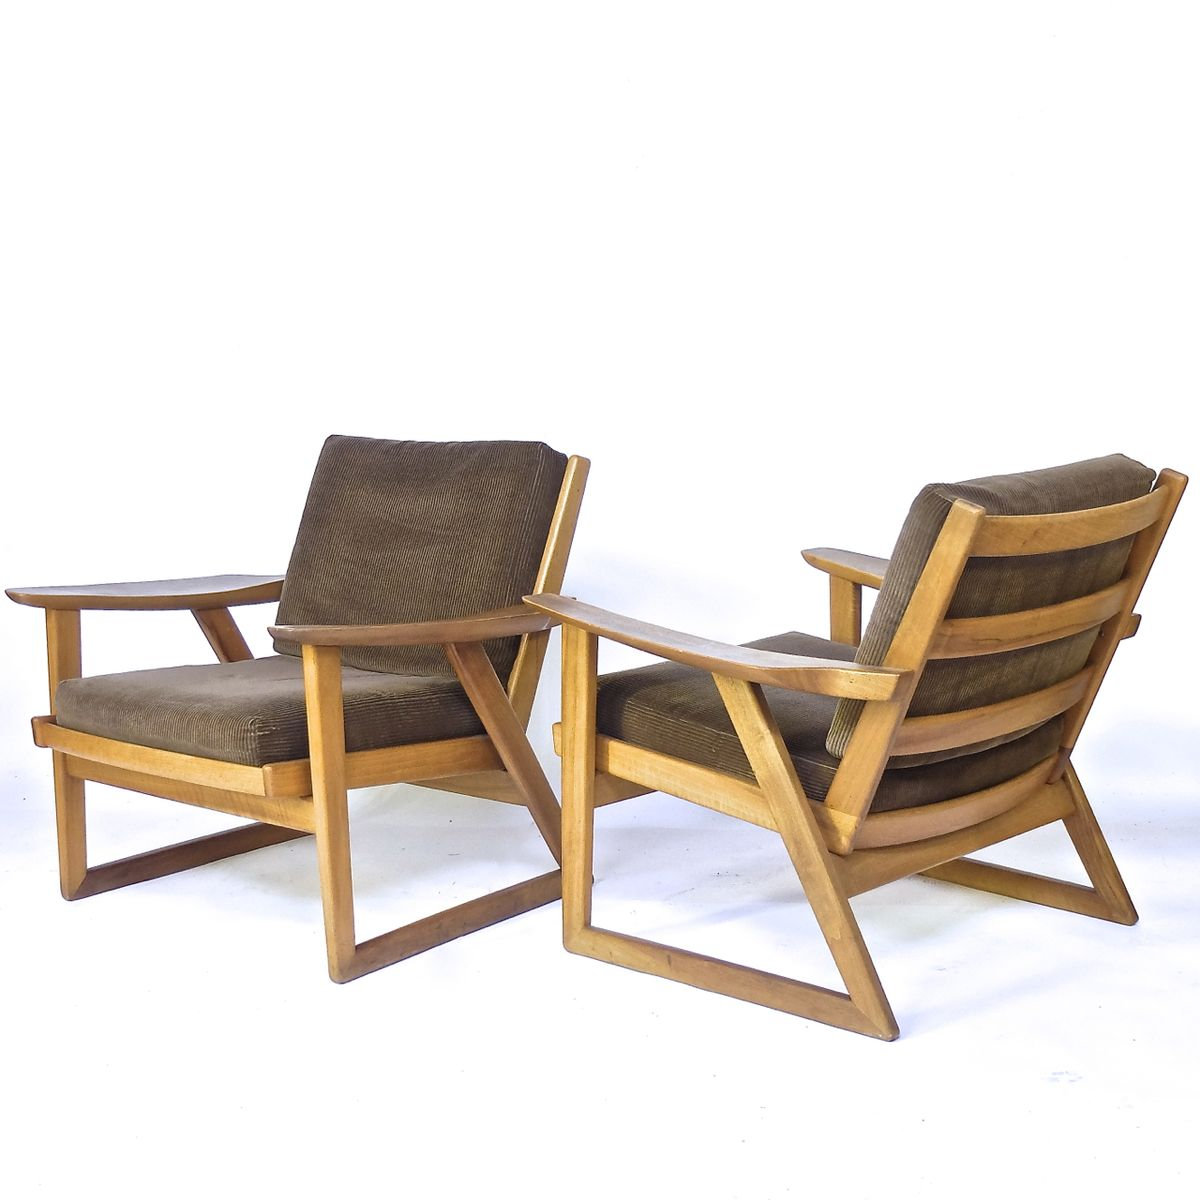 d nische mid century teak cord sessel 2er set bei pamono kaufen. Black Bedroom Furniture Sets. Home Design Ideas